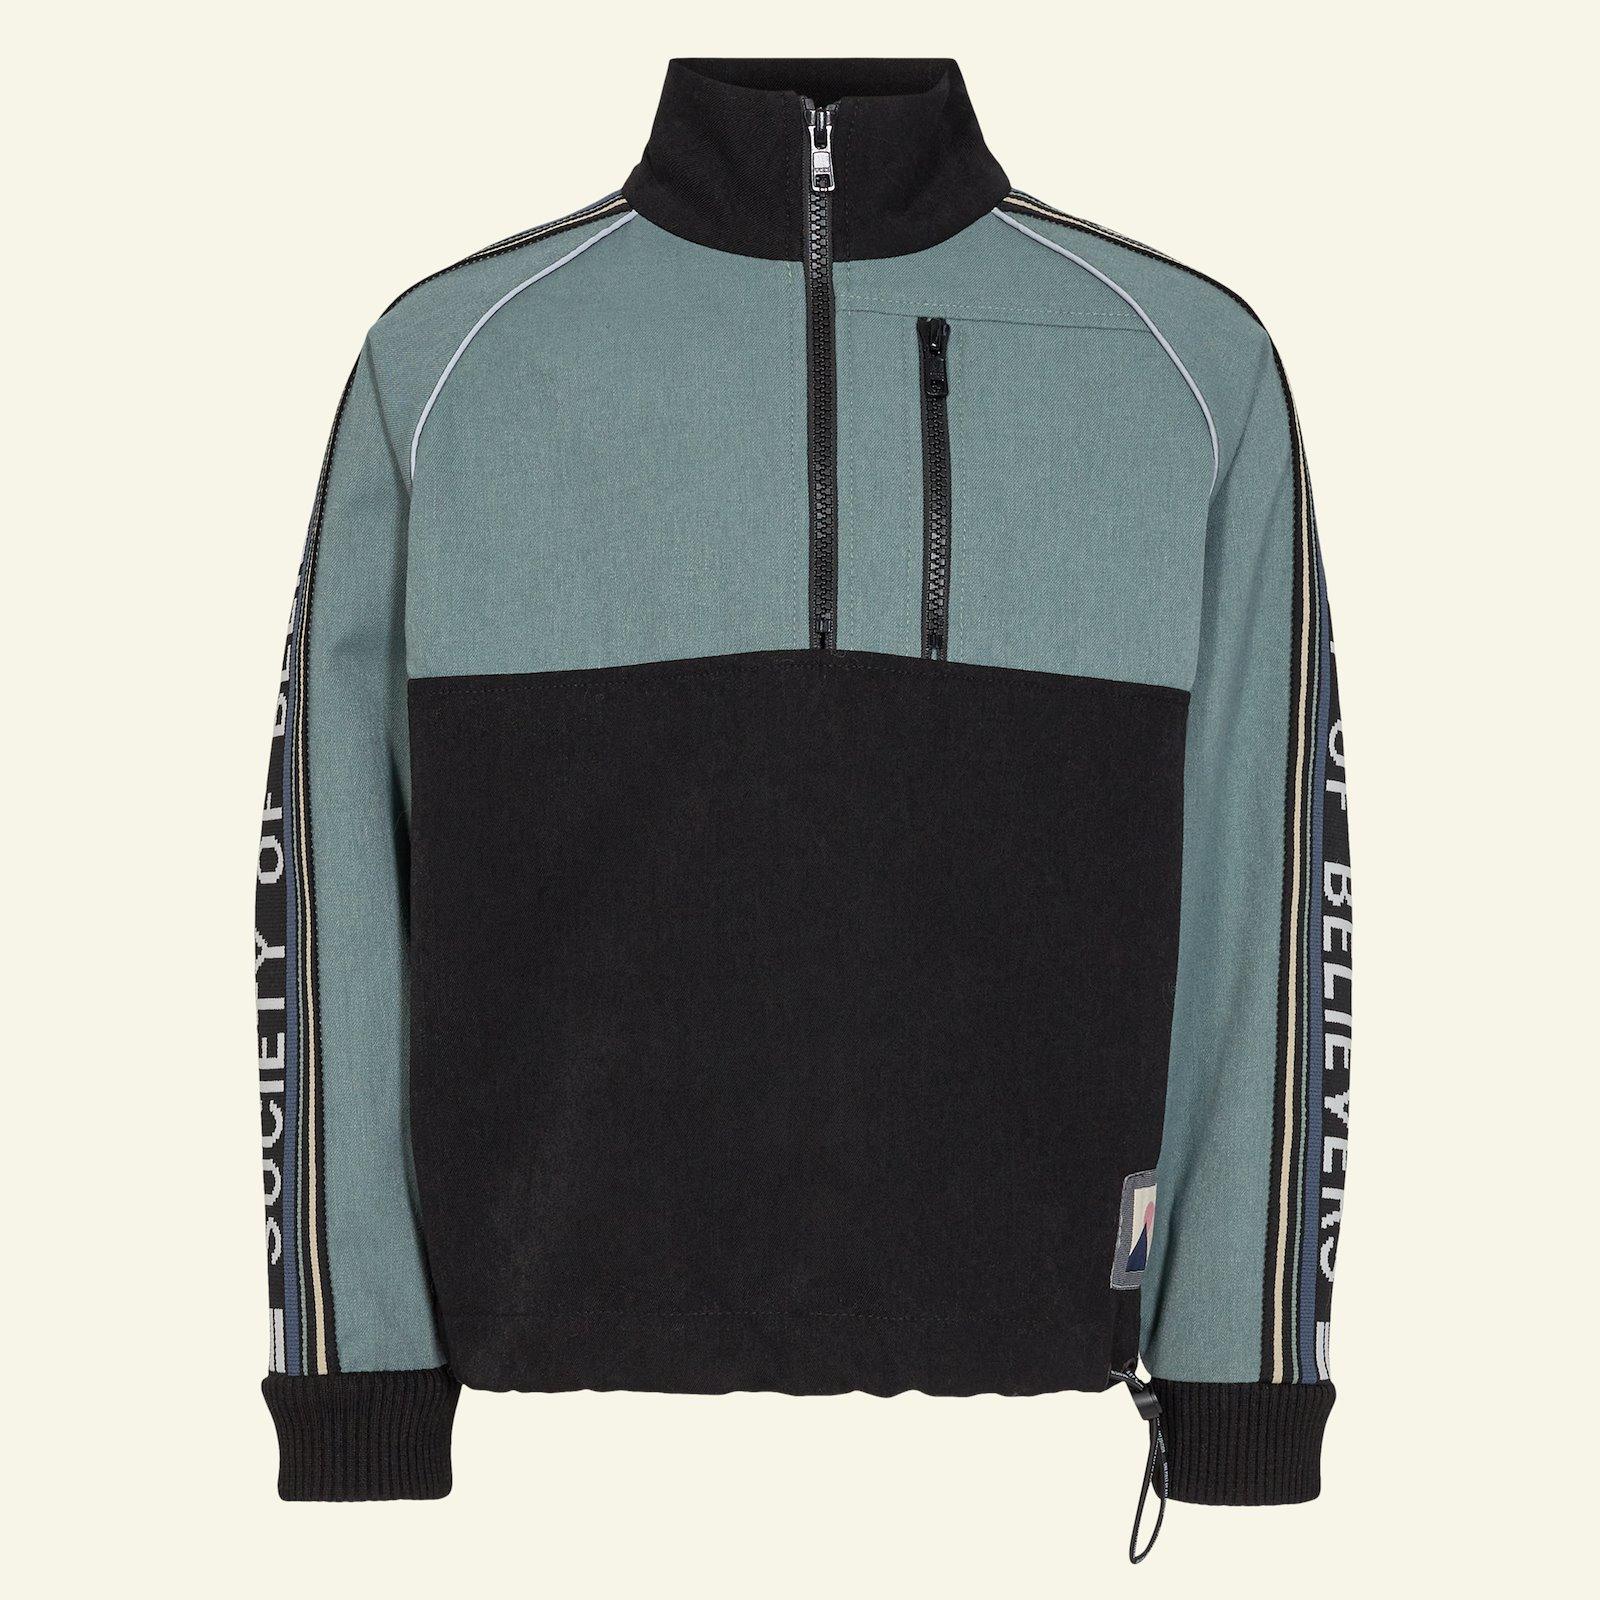 Anorak and jacket, 128/8y p64020_650744_650746_272436_96077_3509089_72091_sskit